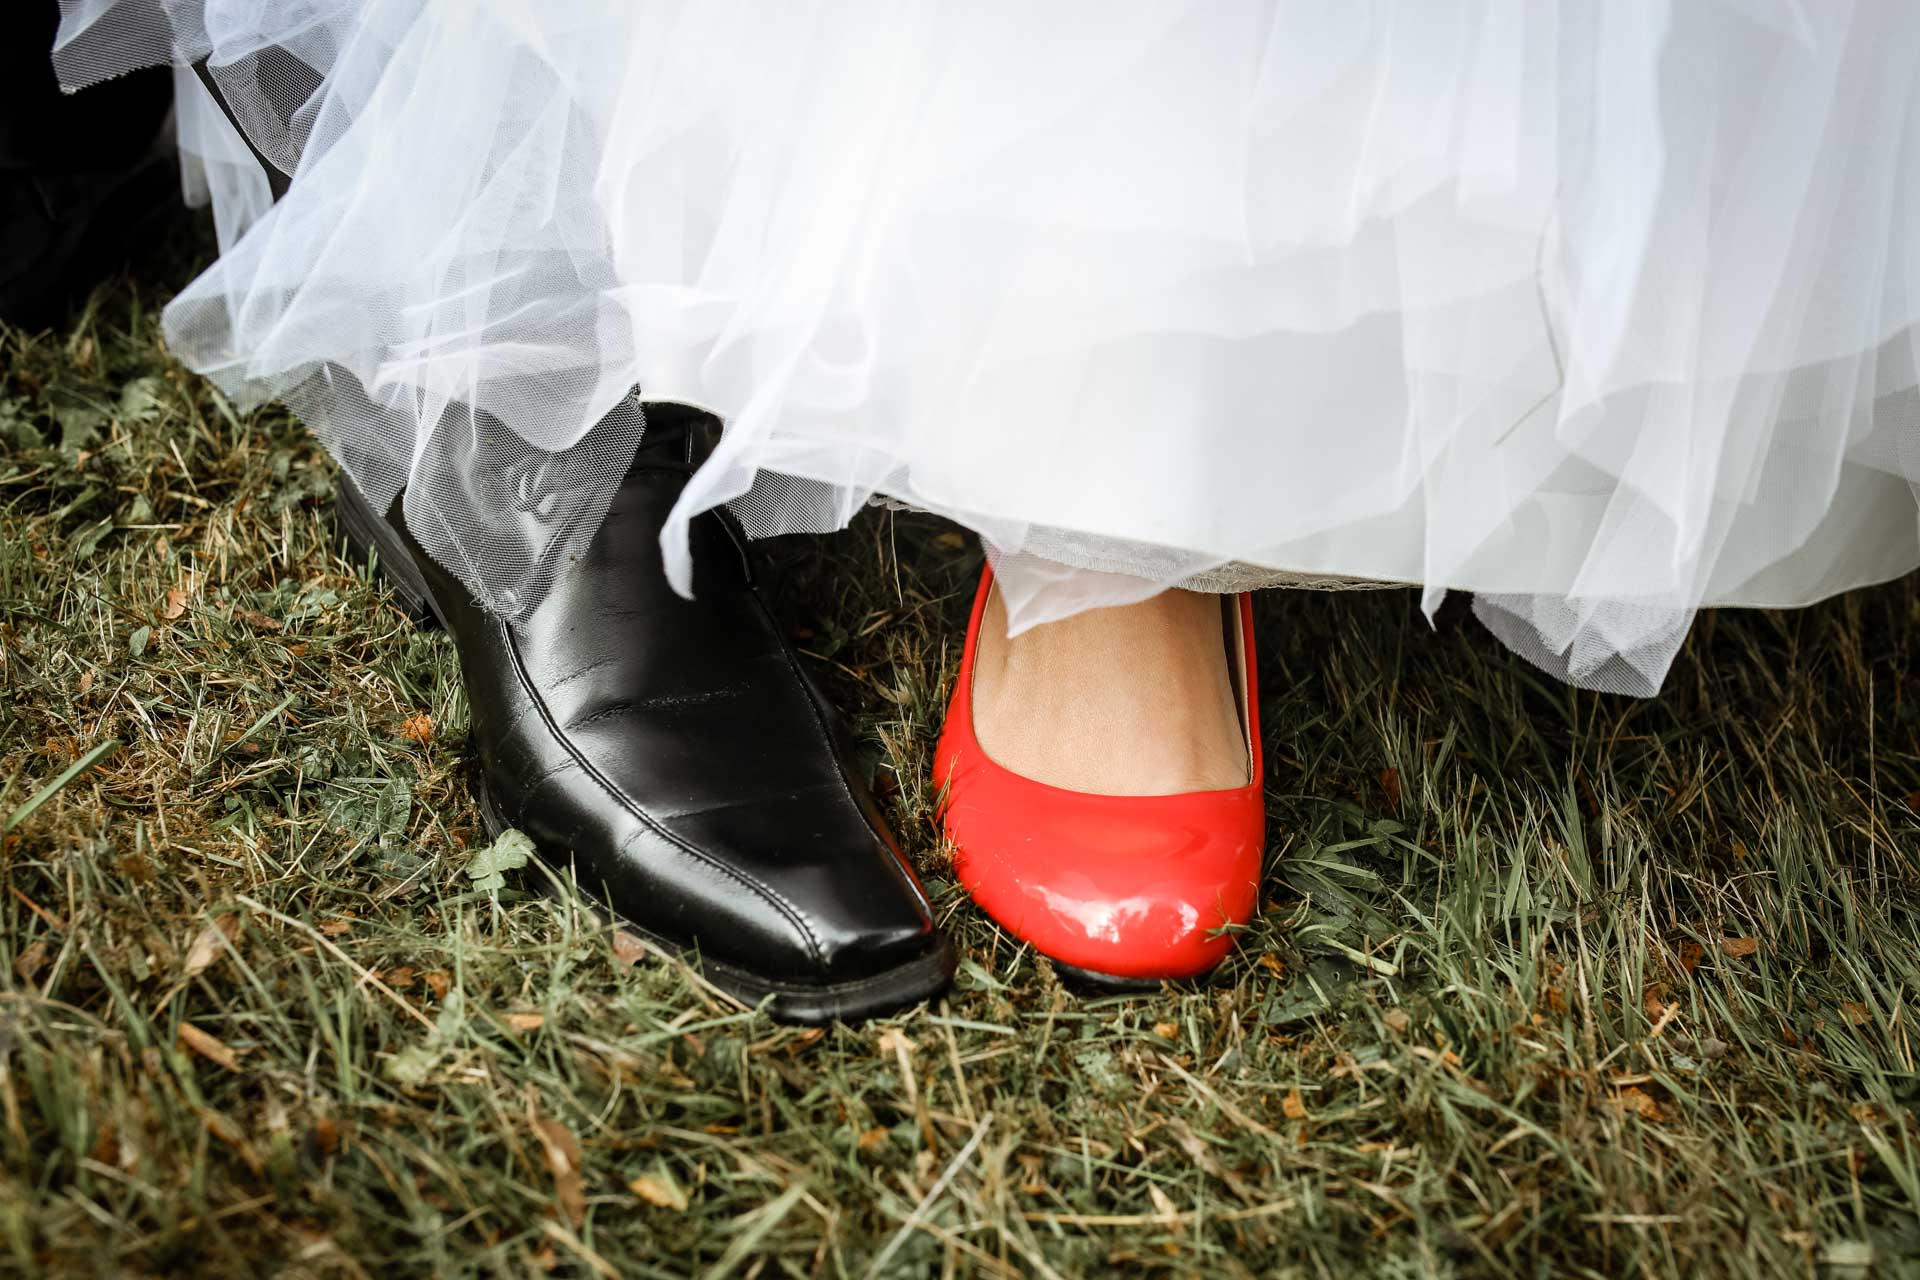 les chaussures de mariees en gros plan